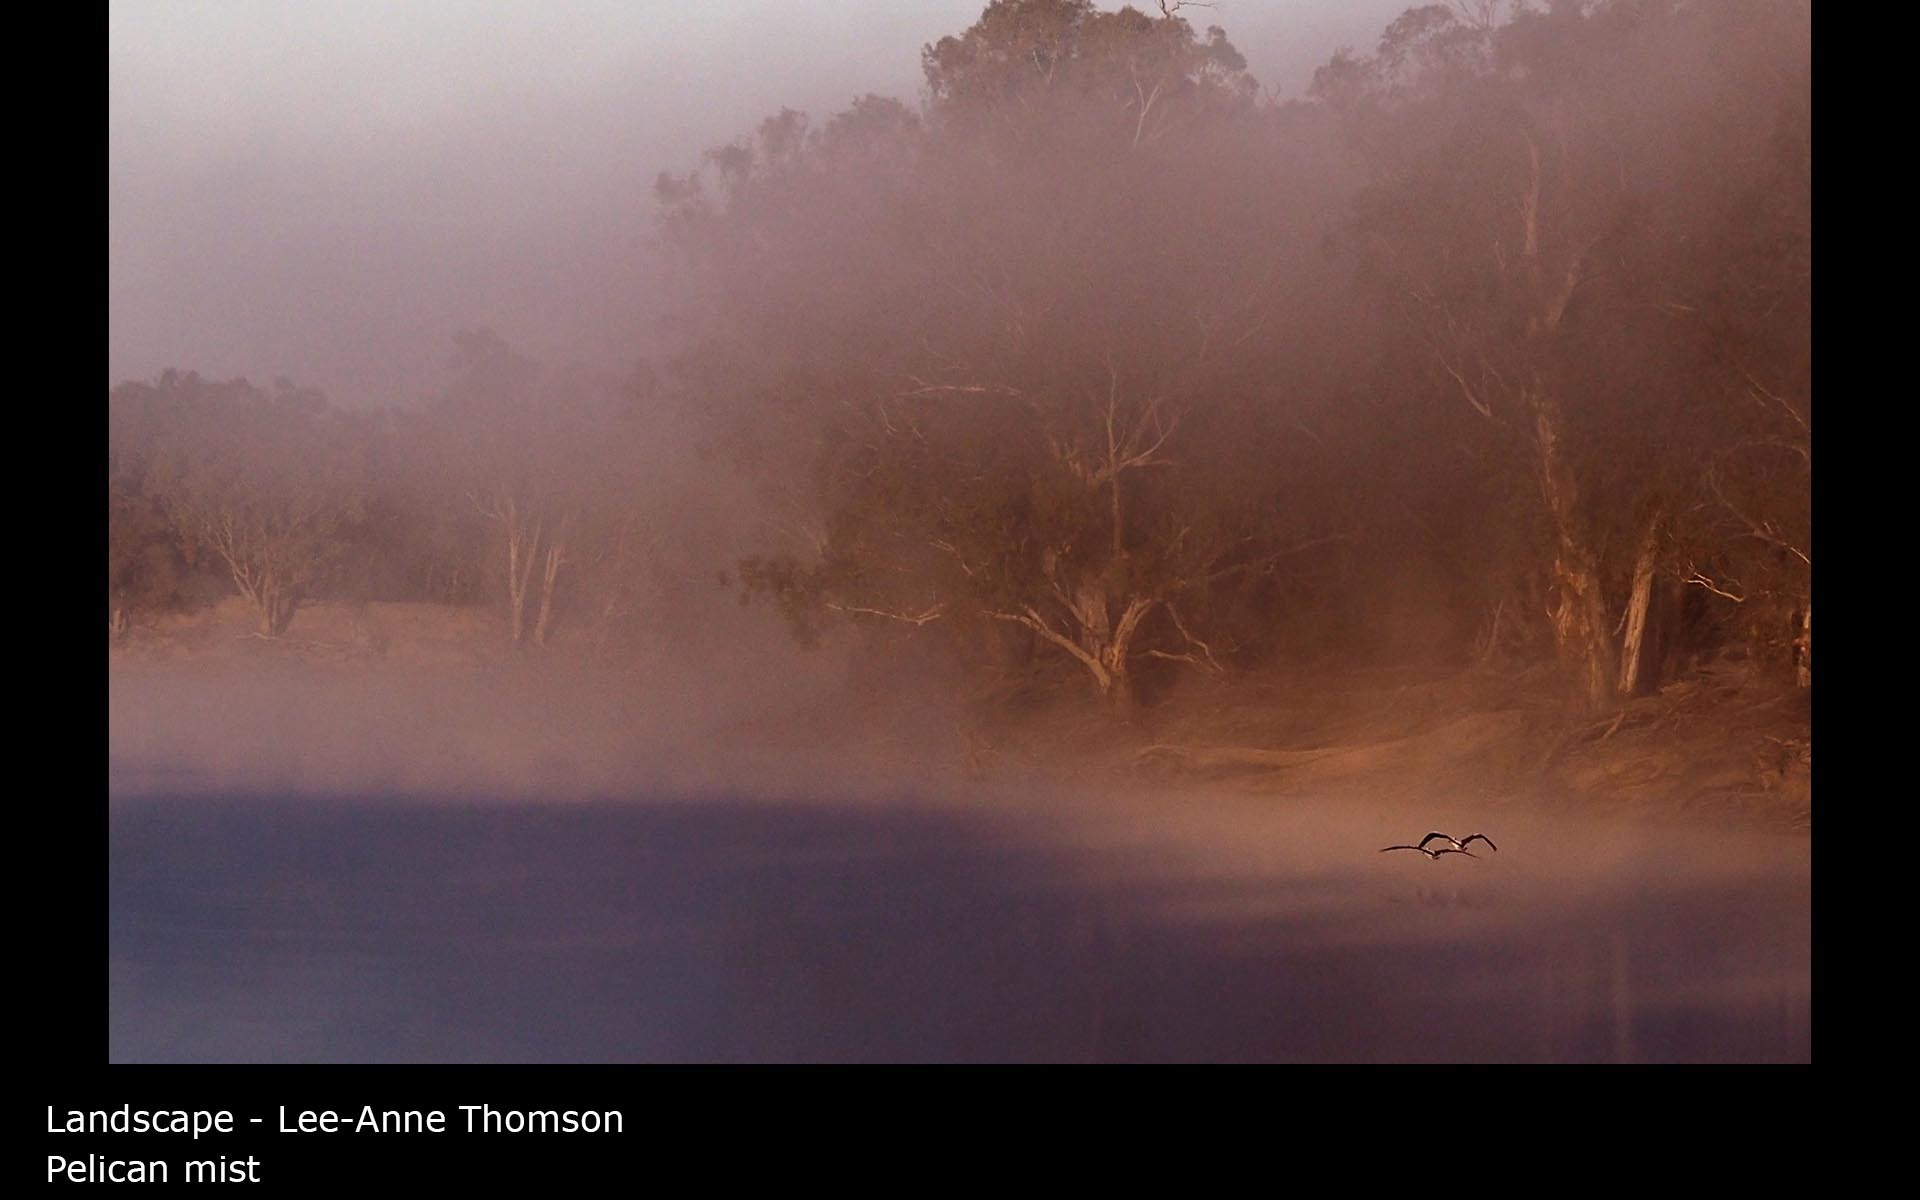 Pelican mist - Lee-Anne Thomson